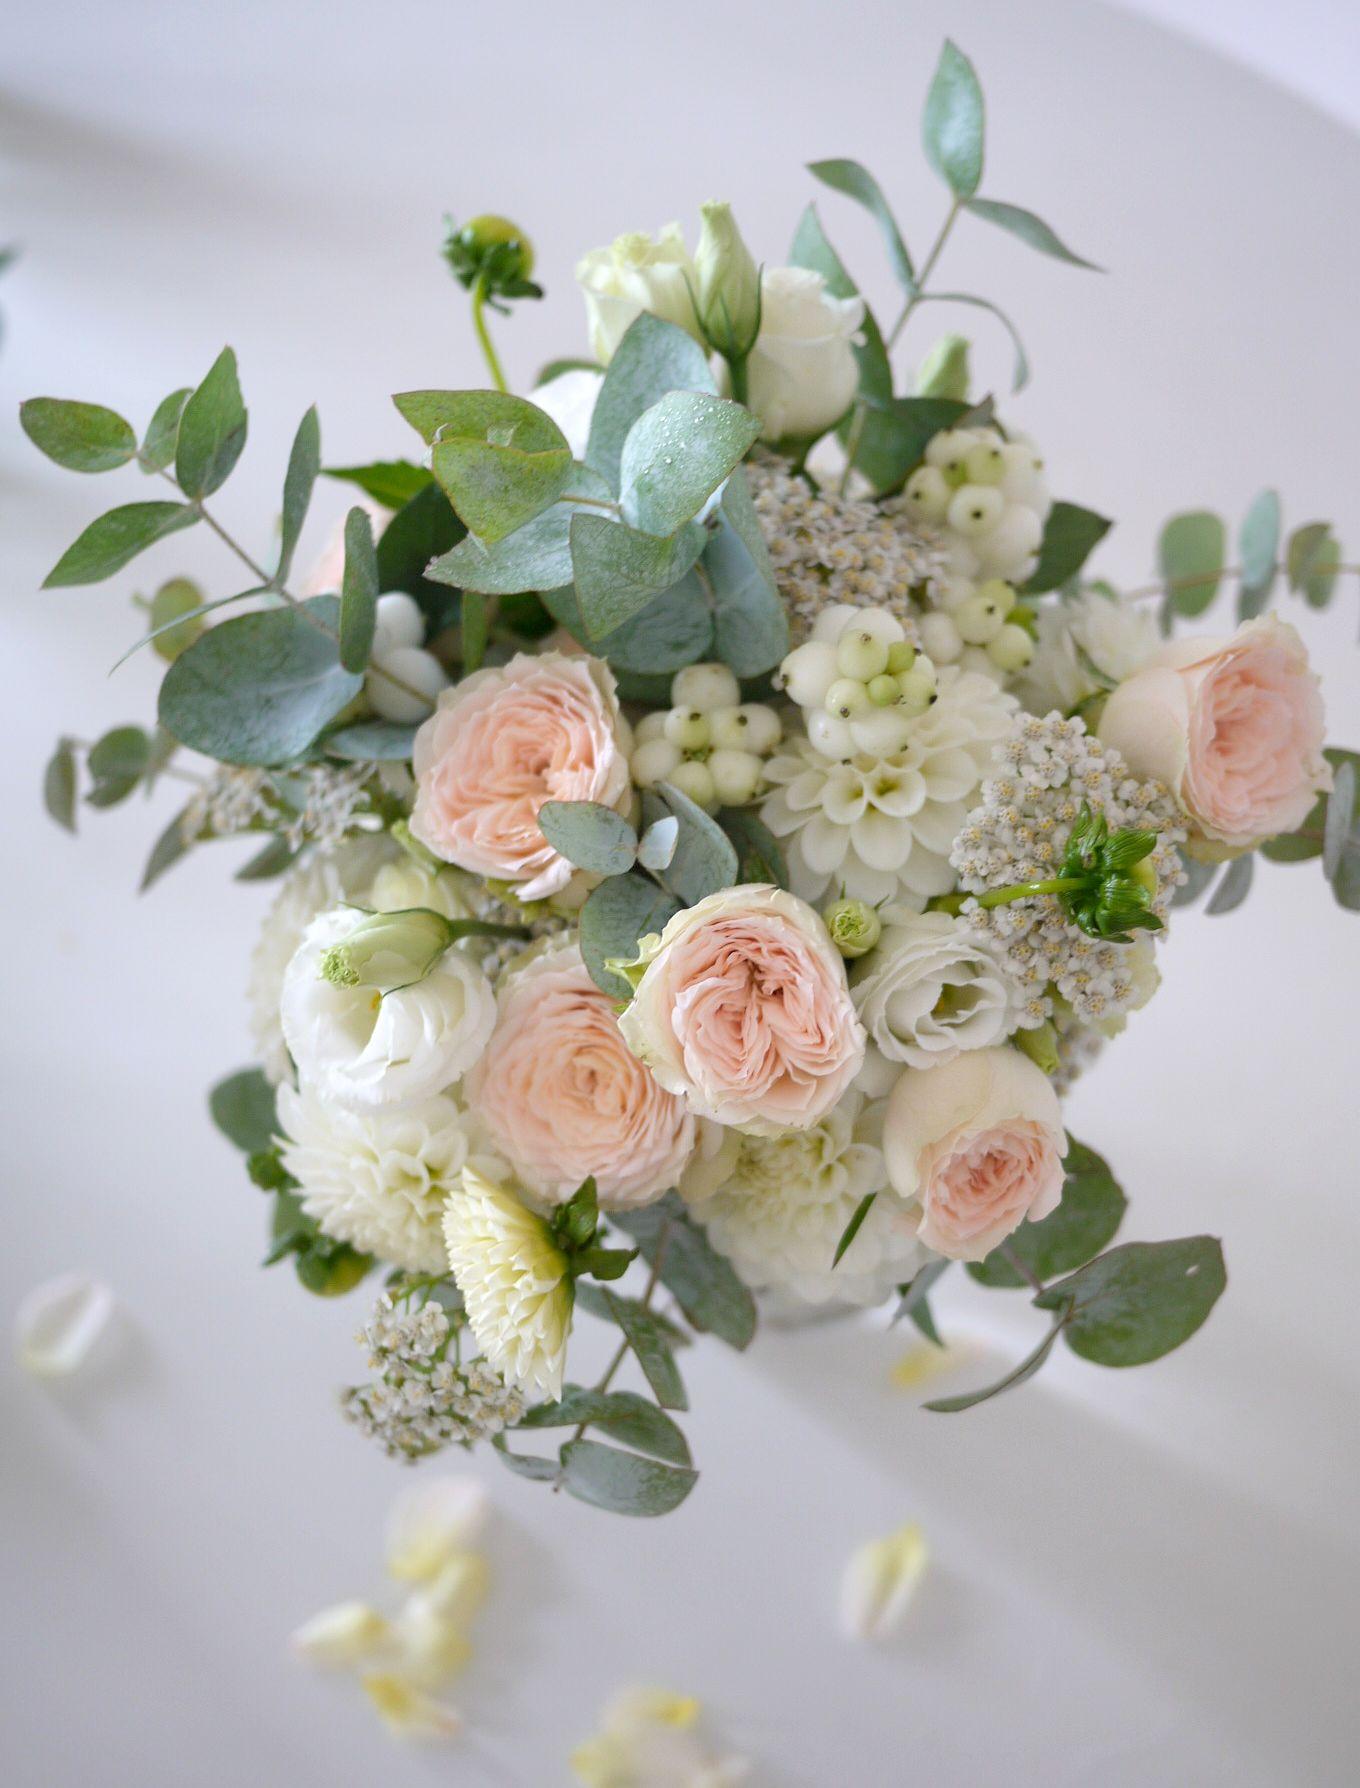 rose, lisianthus, symphoricarpos, eucharis, dahlia,